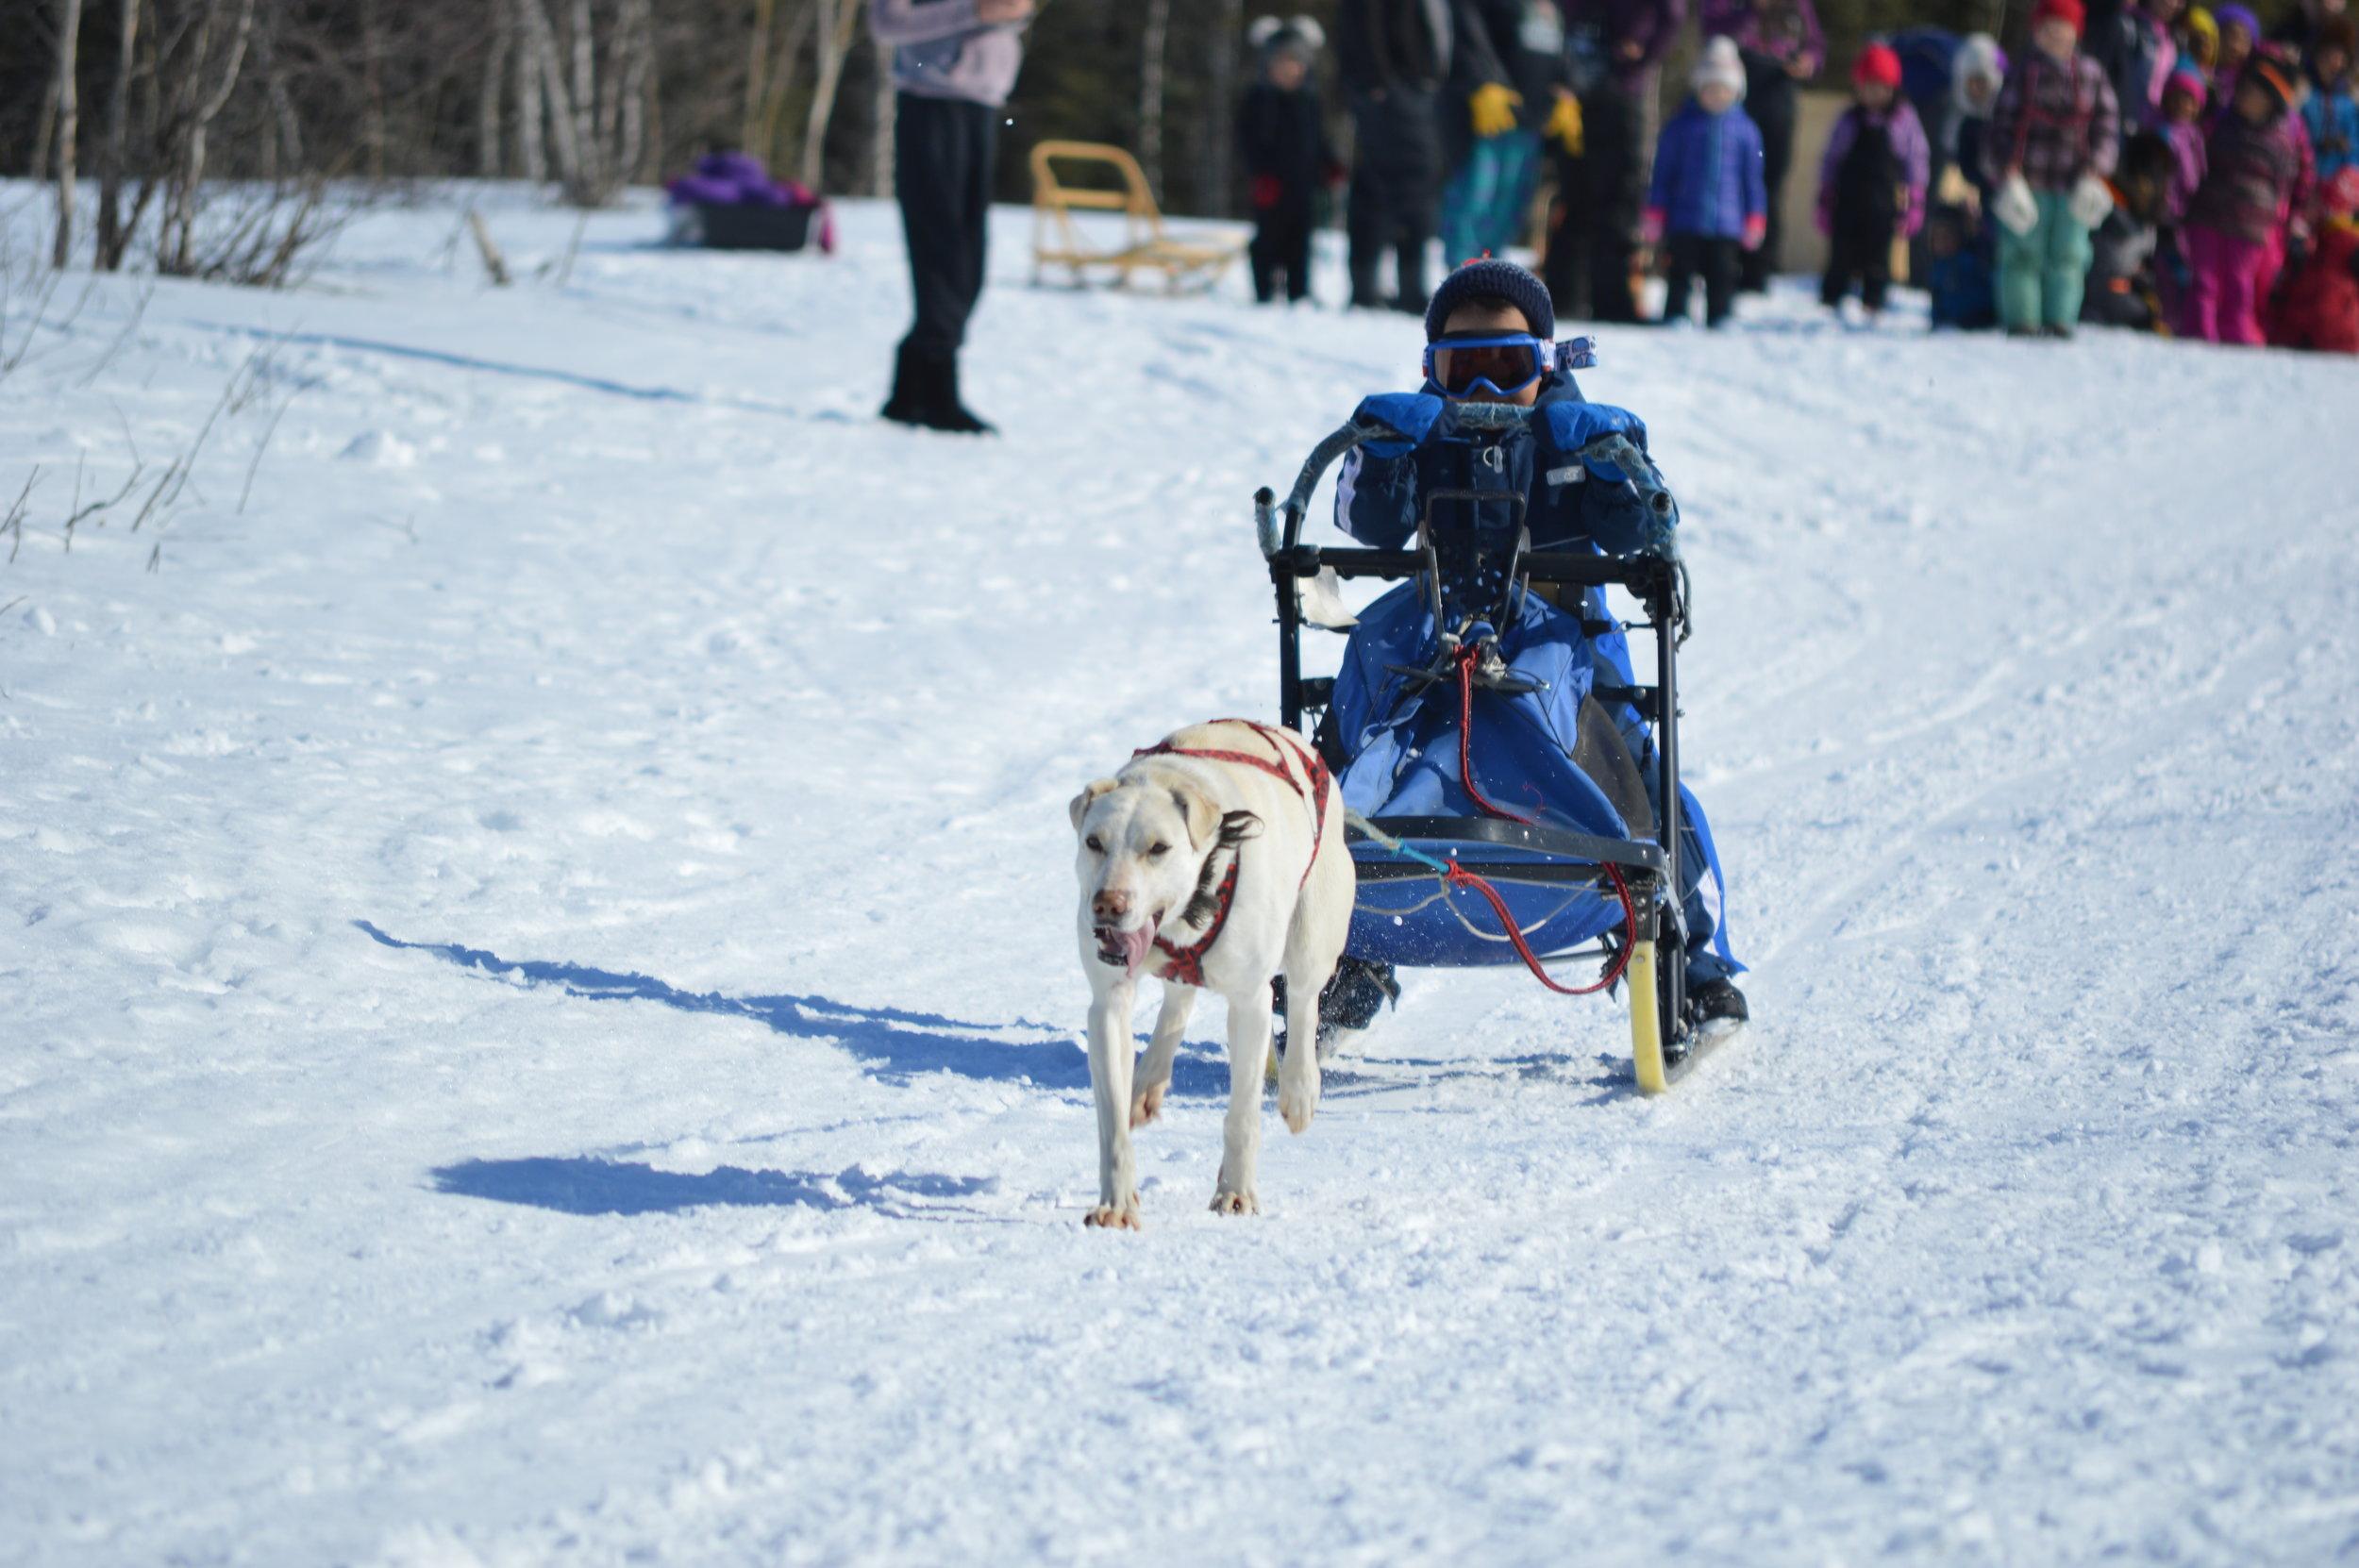 Huslia Jr. Carnival - One-dog racer on the move!